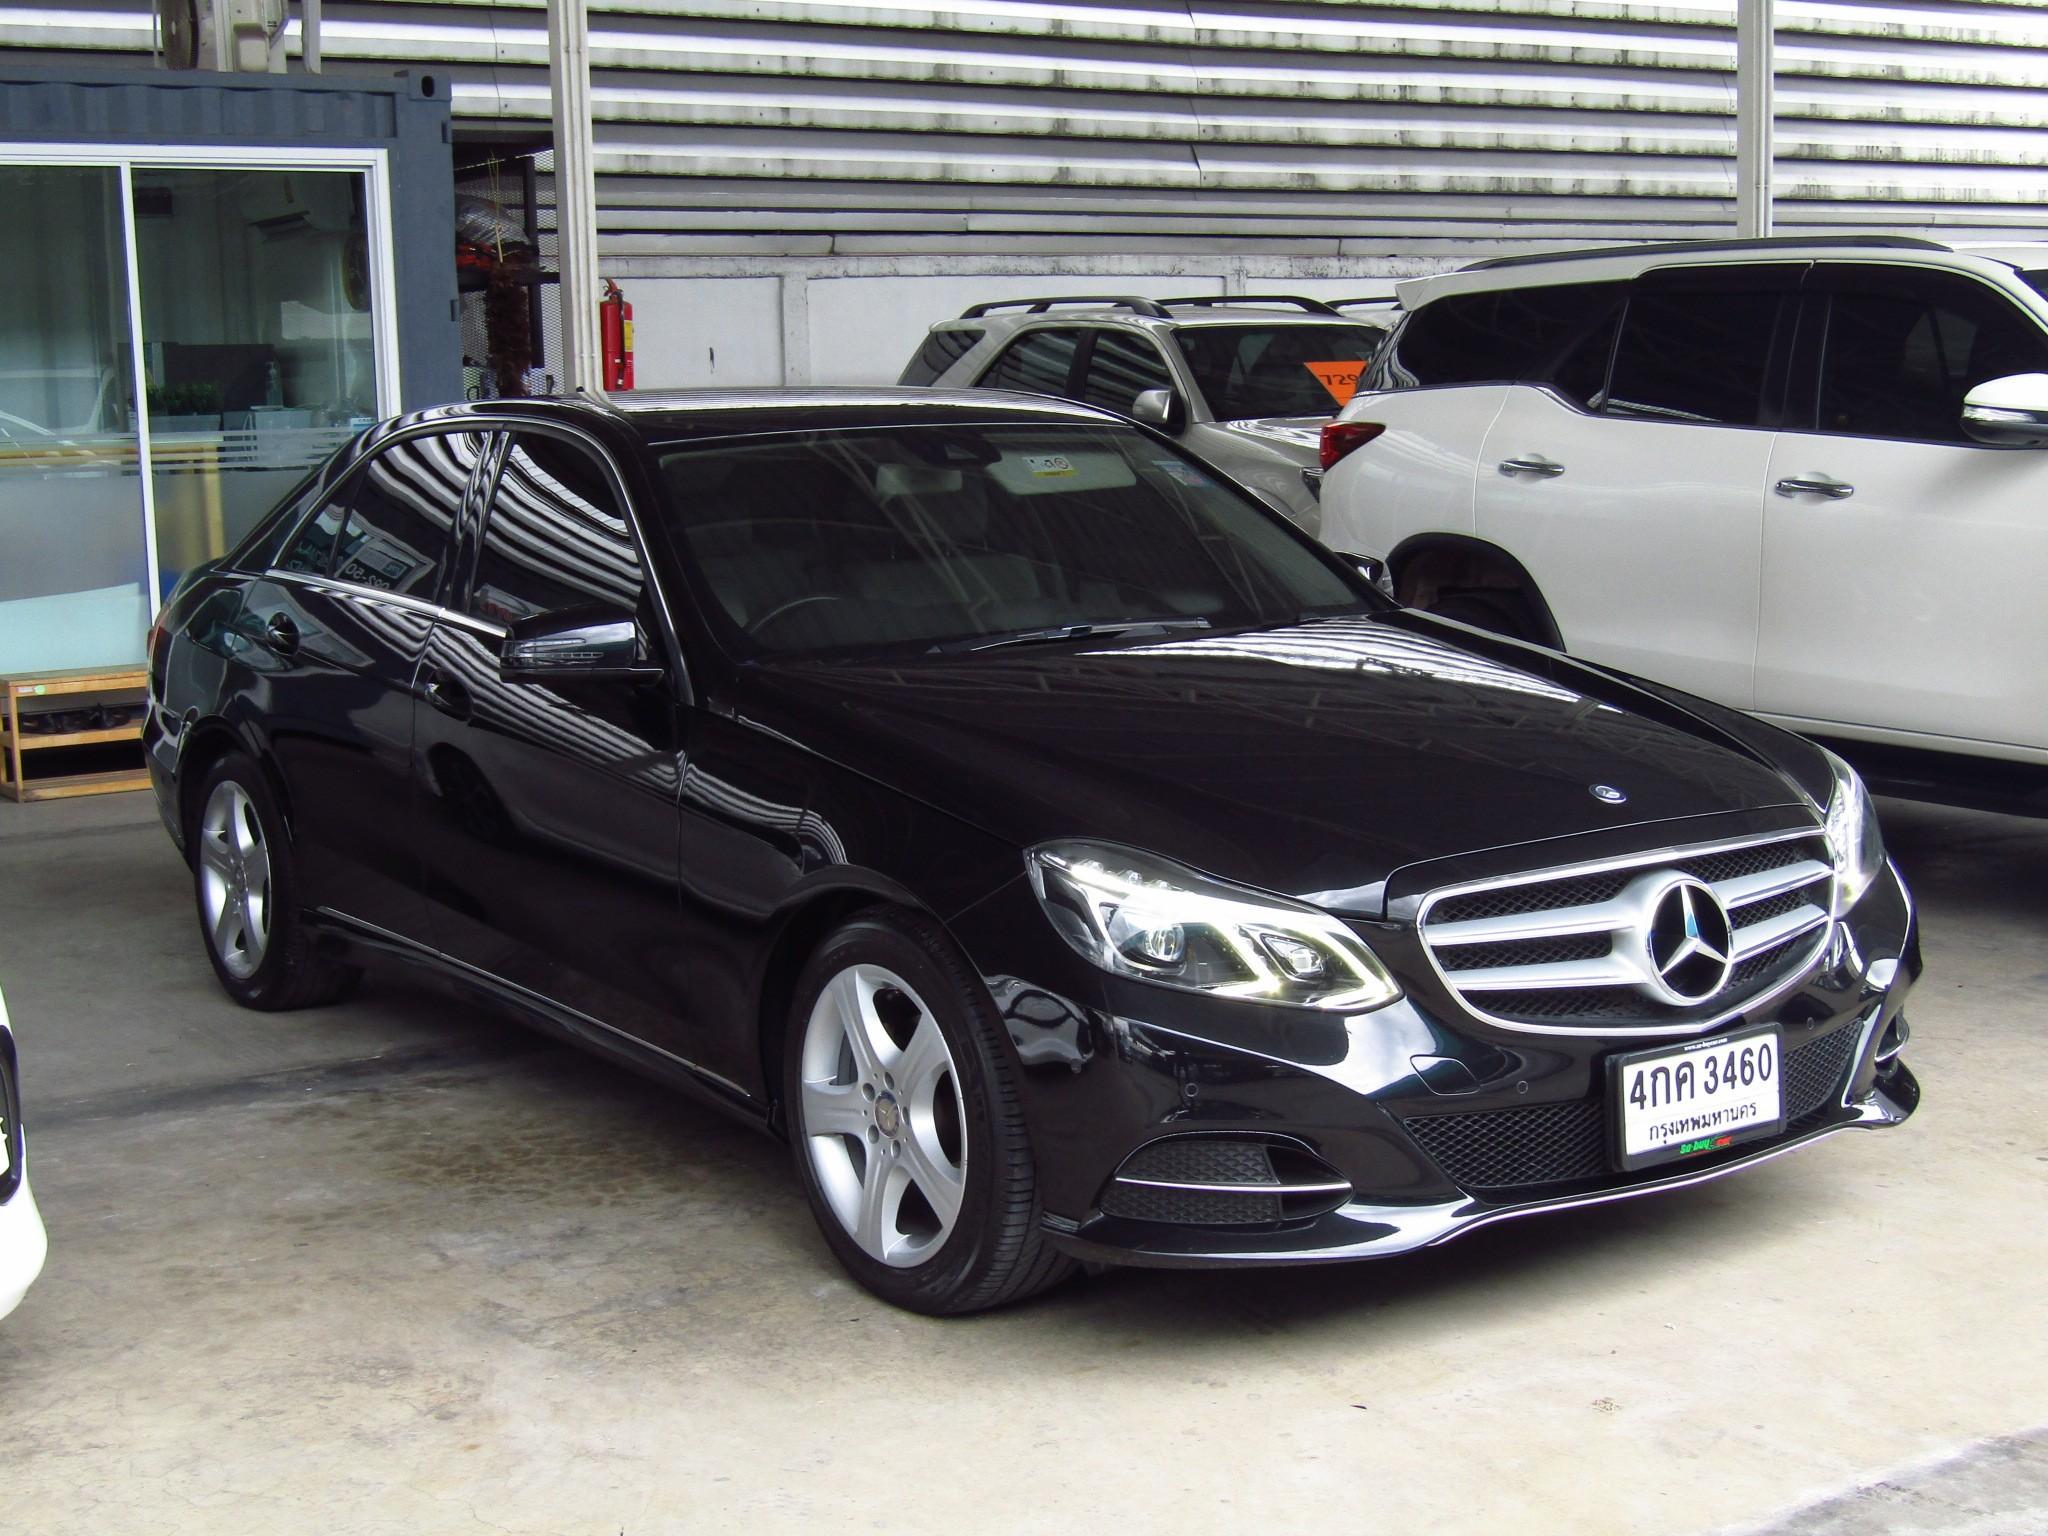 Mercedes-Benz (124,xxx) E200 AVANTGARDE FACELIFT (CKD) AT Sedan (ผ่อน 33,580บาท*48เดือน)